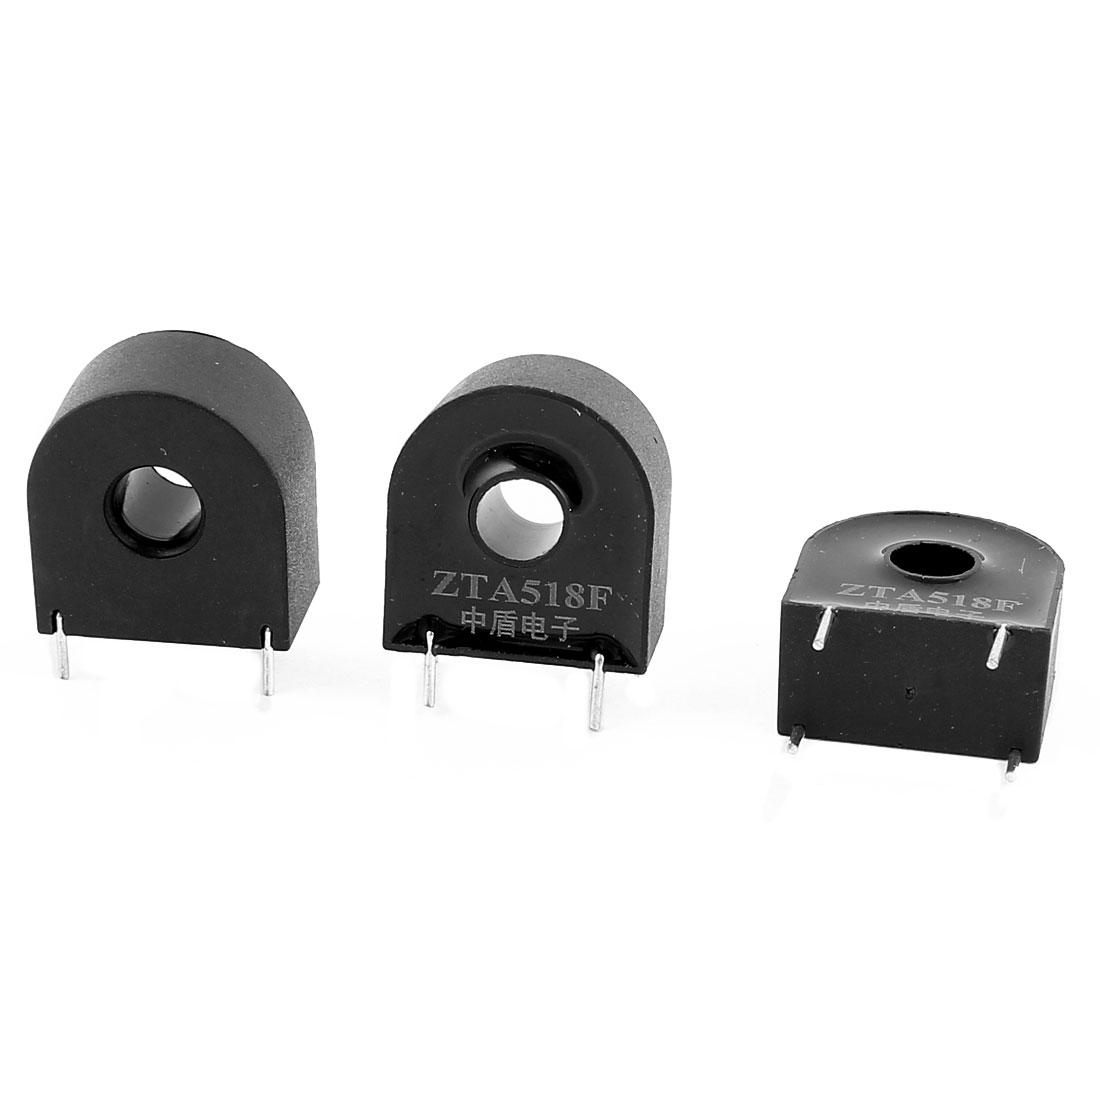 ZTA518F 20A/20mA 4 Terminal Precision AC Micro Current Transformer Sensor 3Pcs